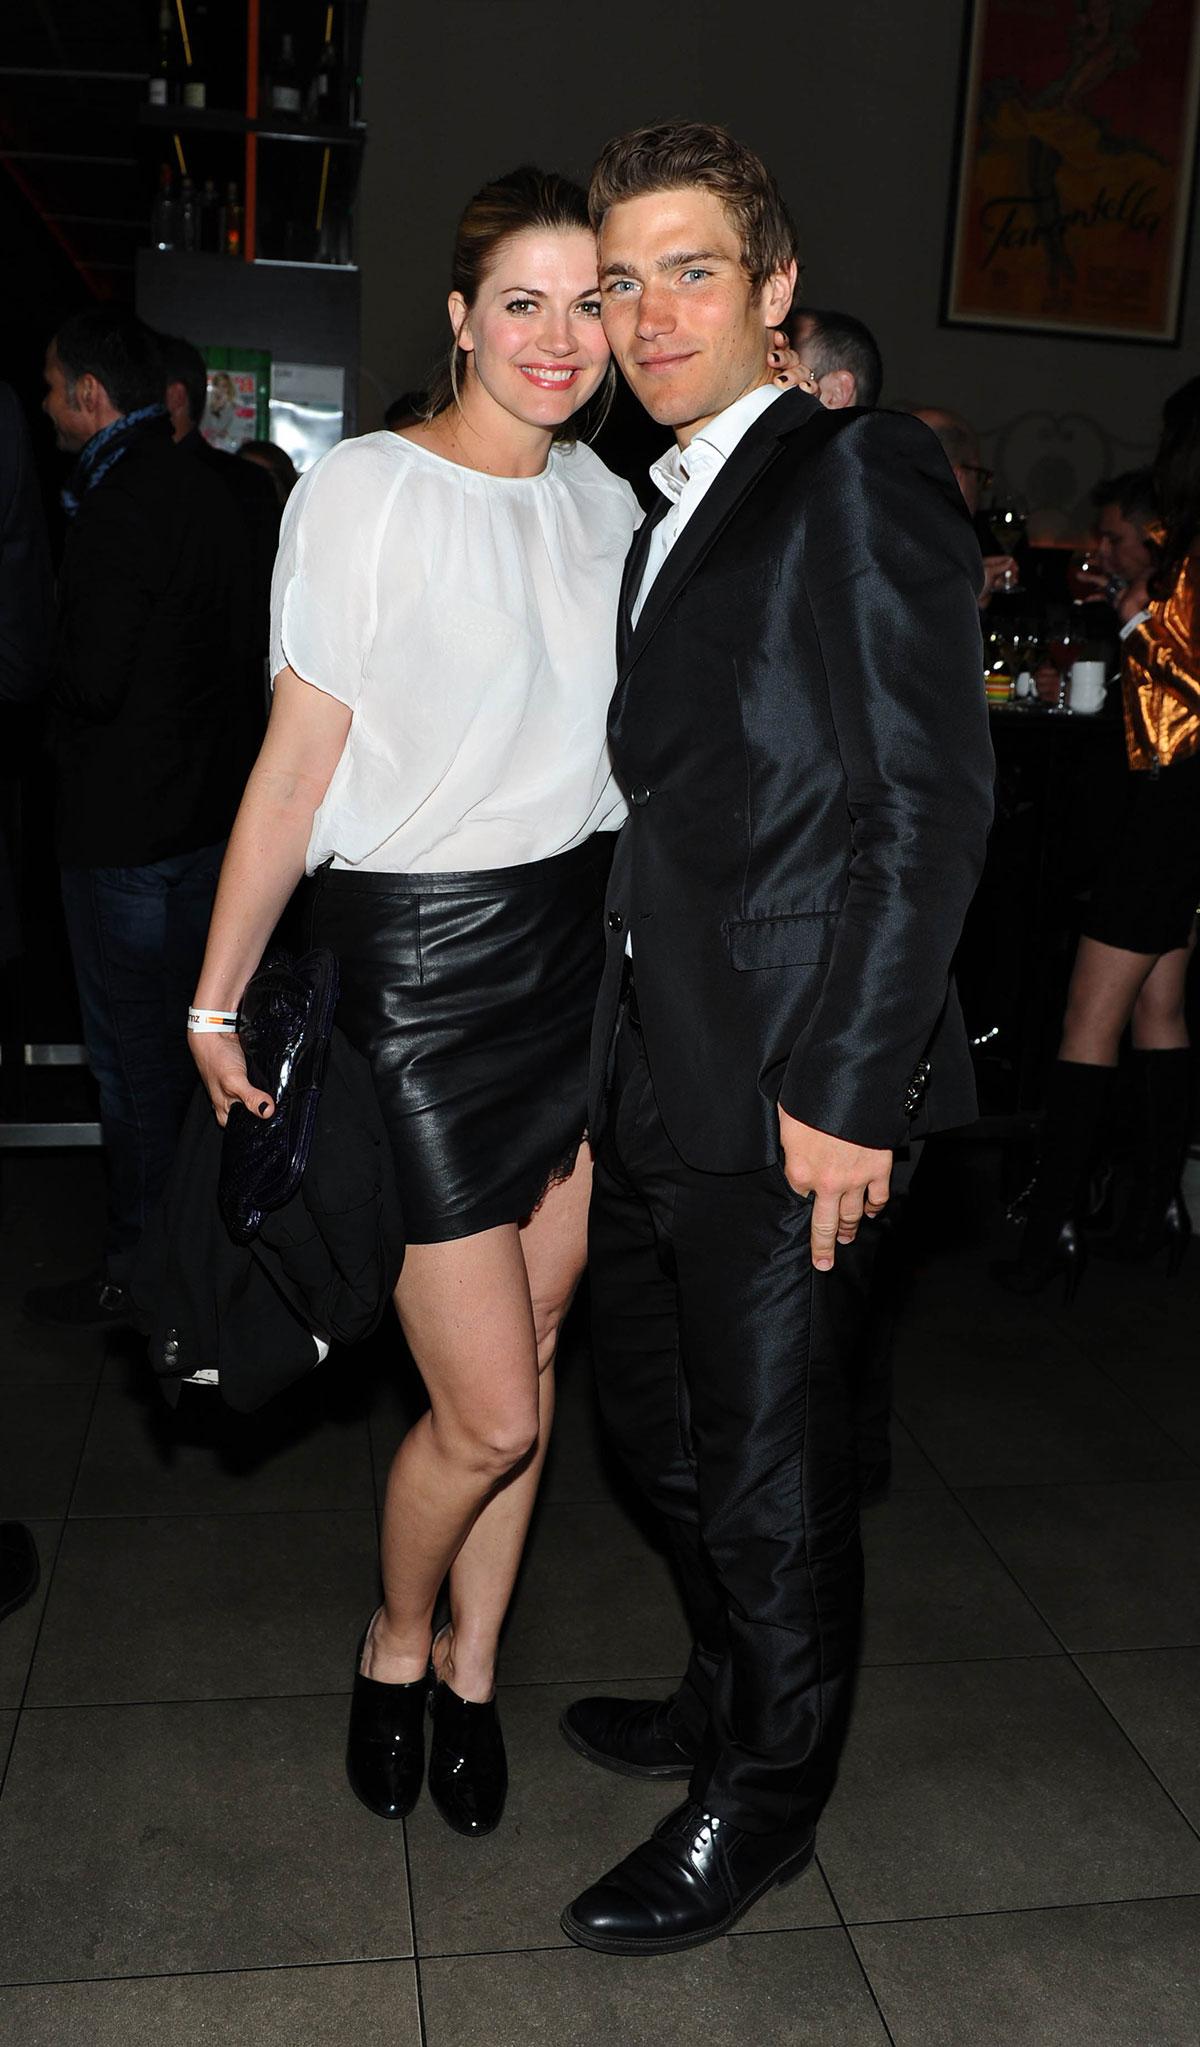 Nina Bott attends the German premiere of the film Zulu